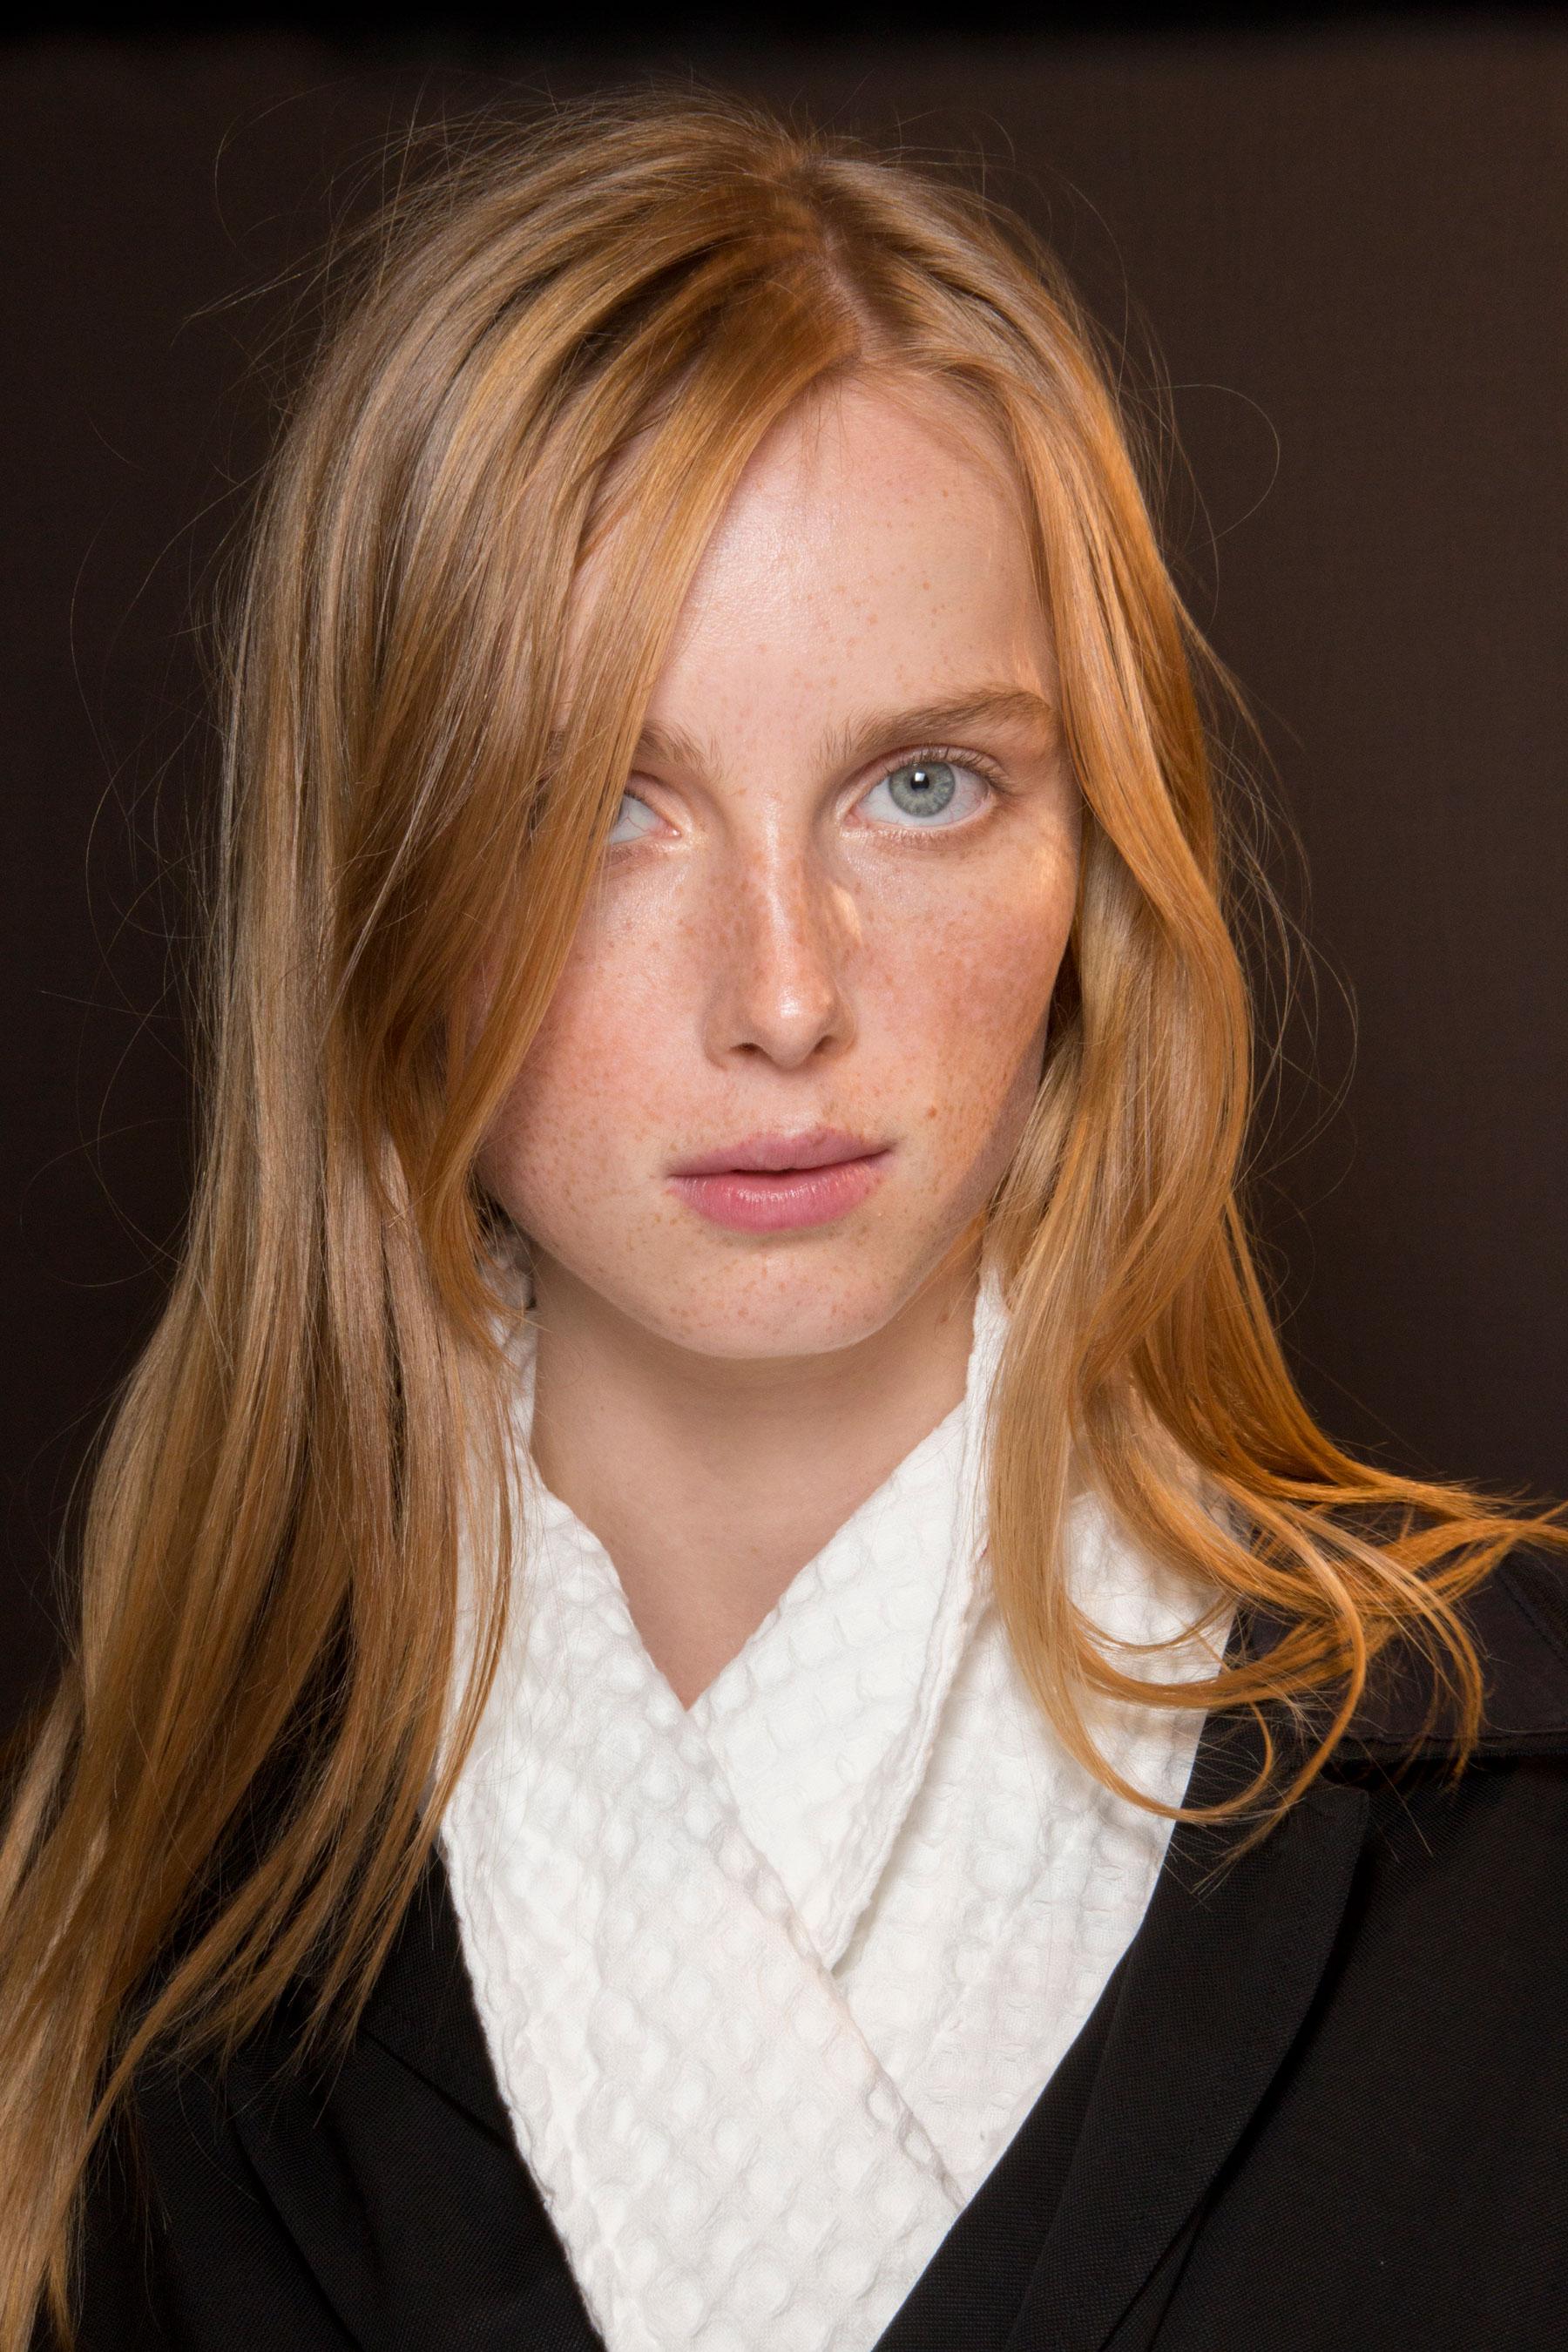 Gucci0-backsatge-beauty-spring-2016-fashion-show-the-impression-078